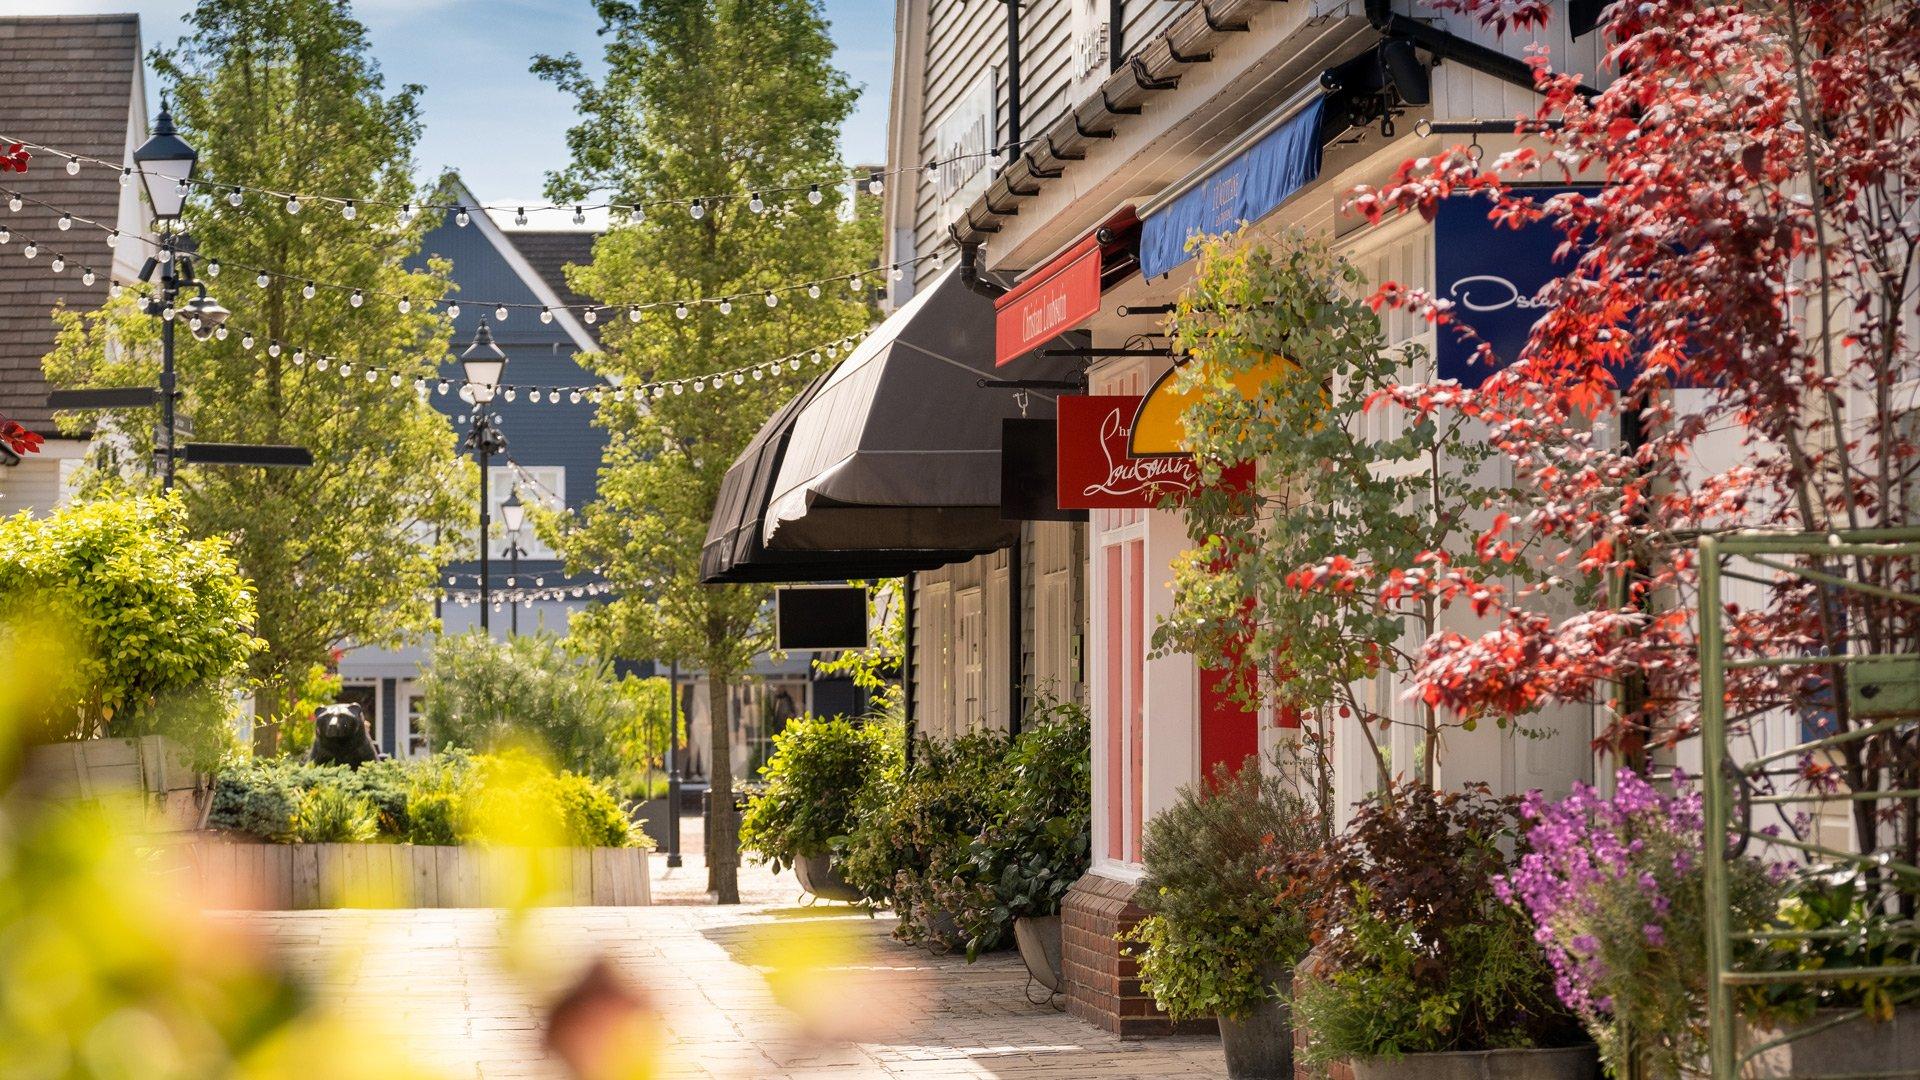 bicester-luxury-shopping-village